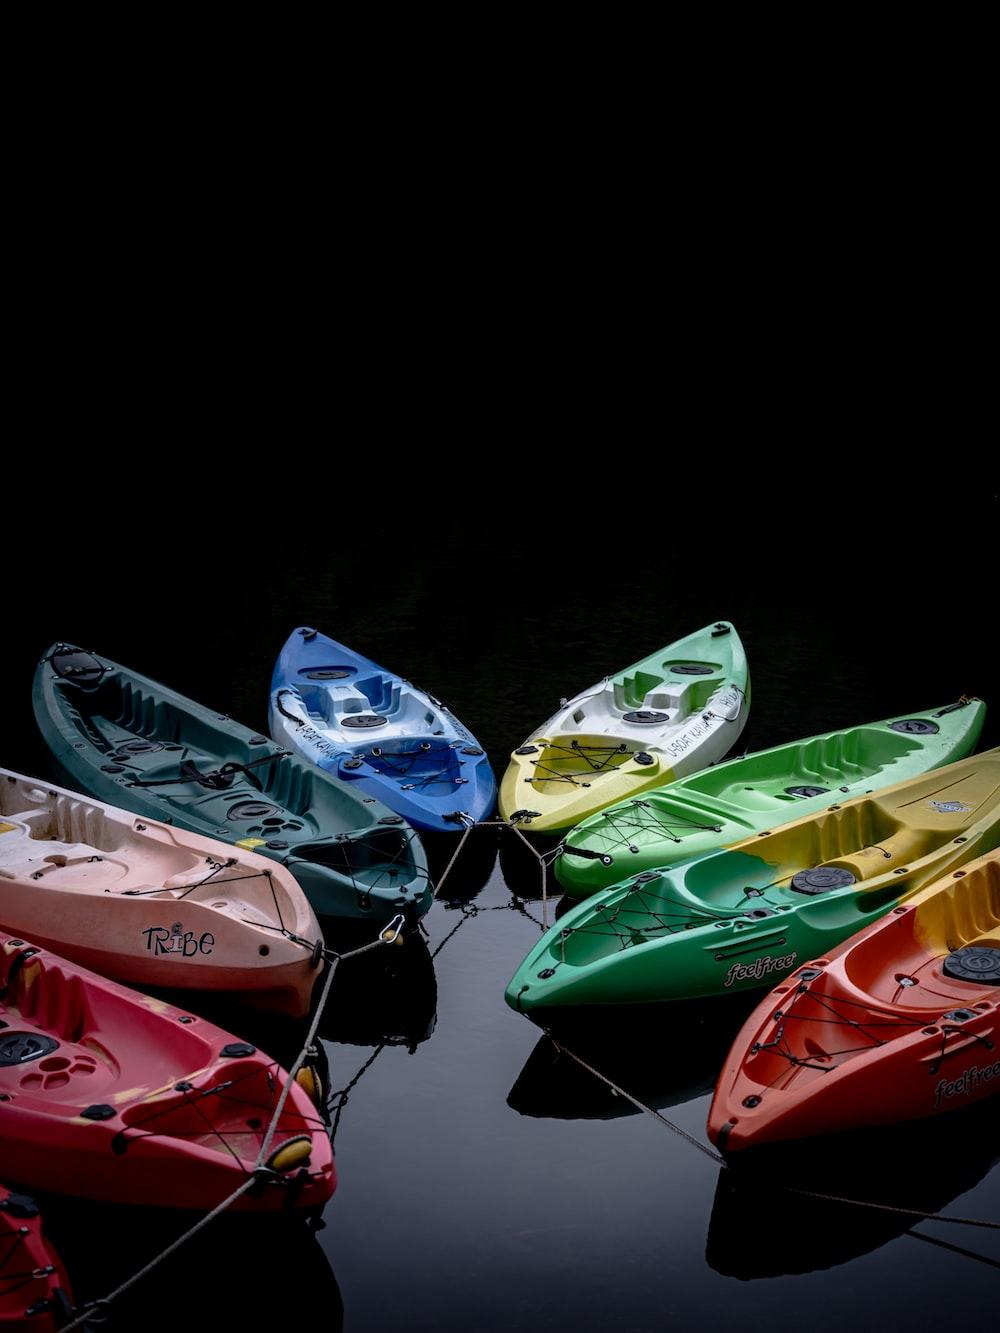 assorted color kayak on black surface